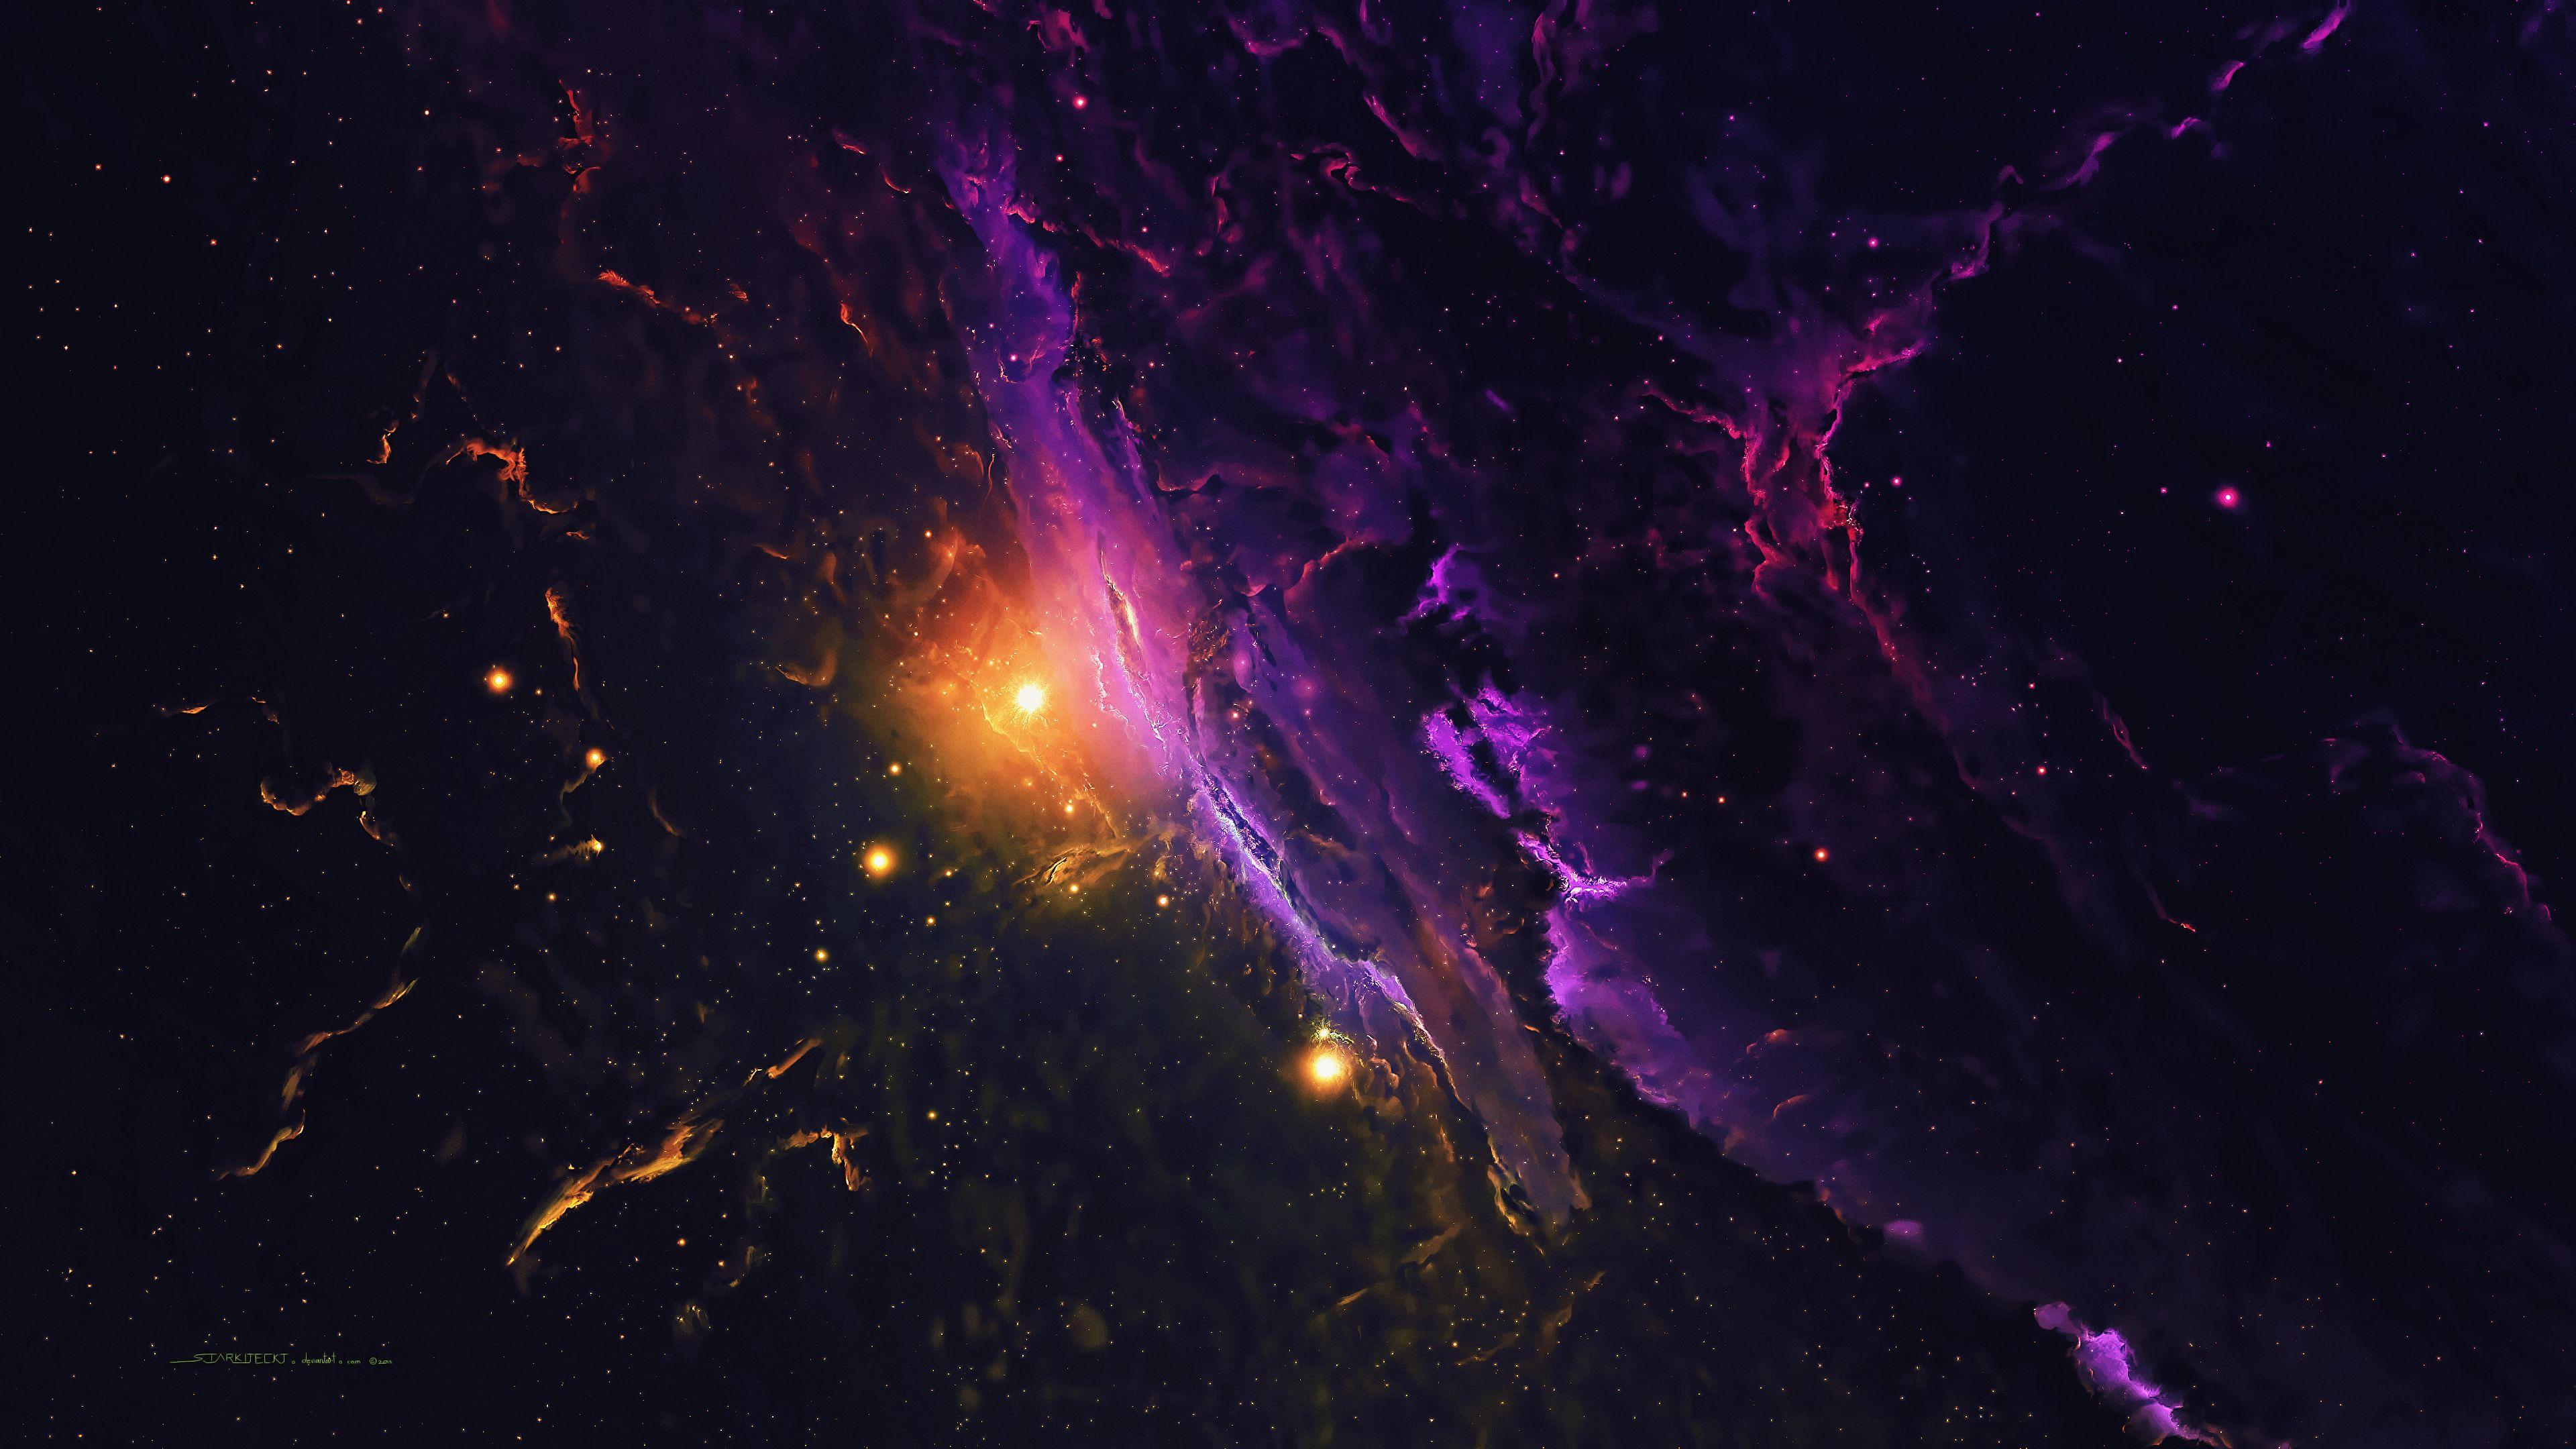 Galaxy 4k Wallpaper 3d Wallpapers Sci Fi Wallpaper Wallpaper Space Nebula Wallpaper